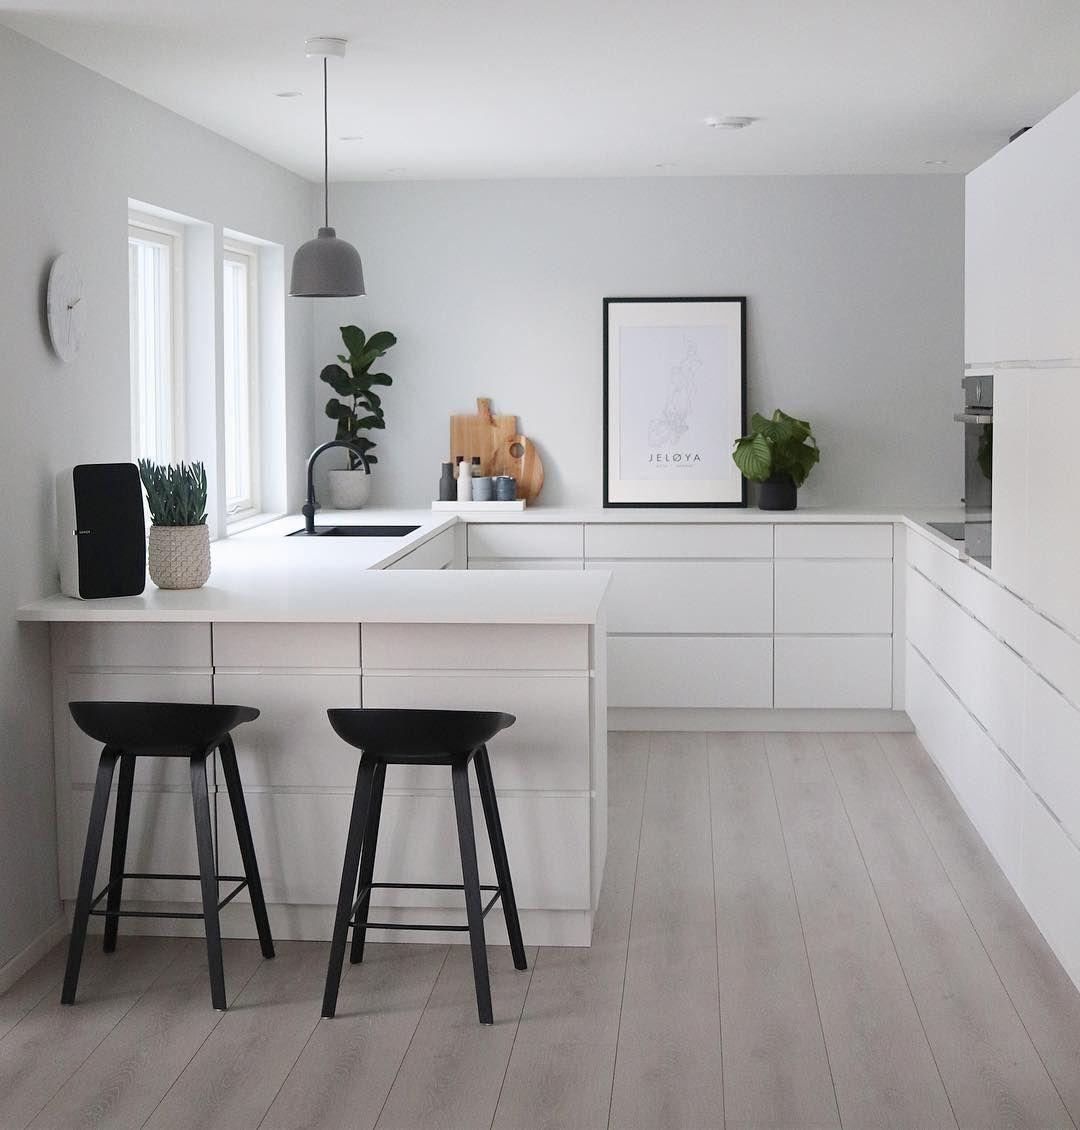 Home interior design kurs sunday funday  kuchnia  pinterest  kitchen kitchen decor and